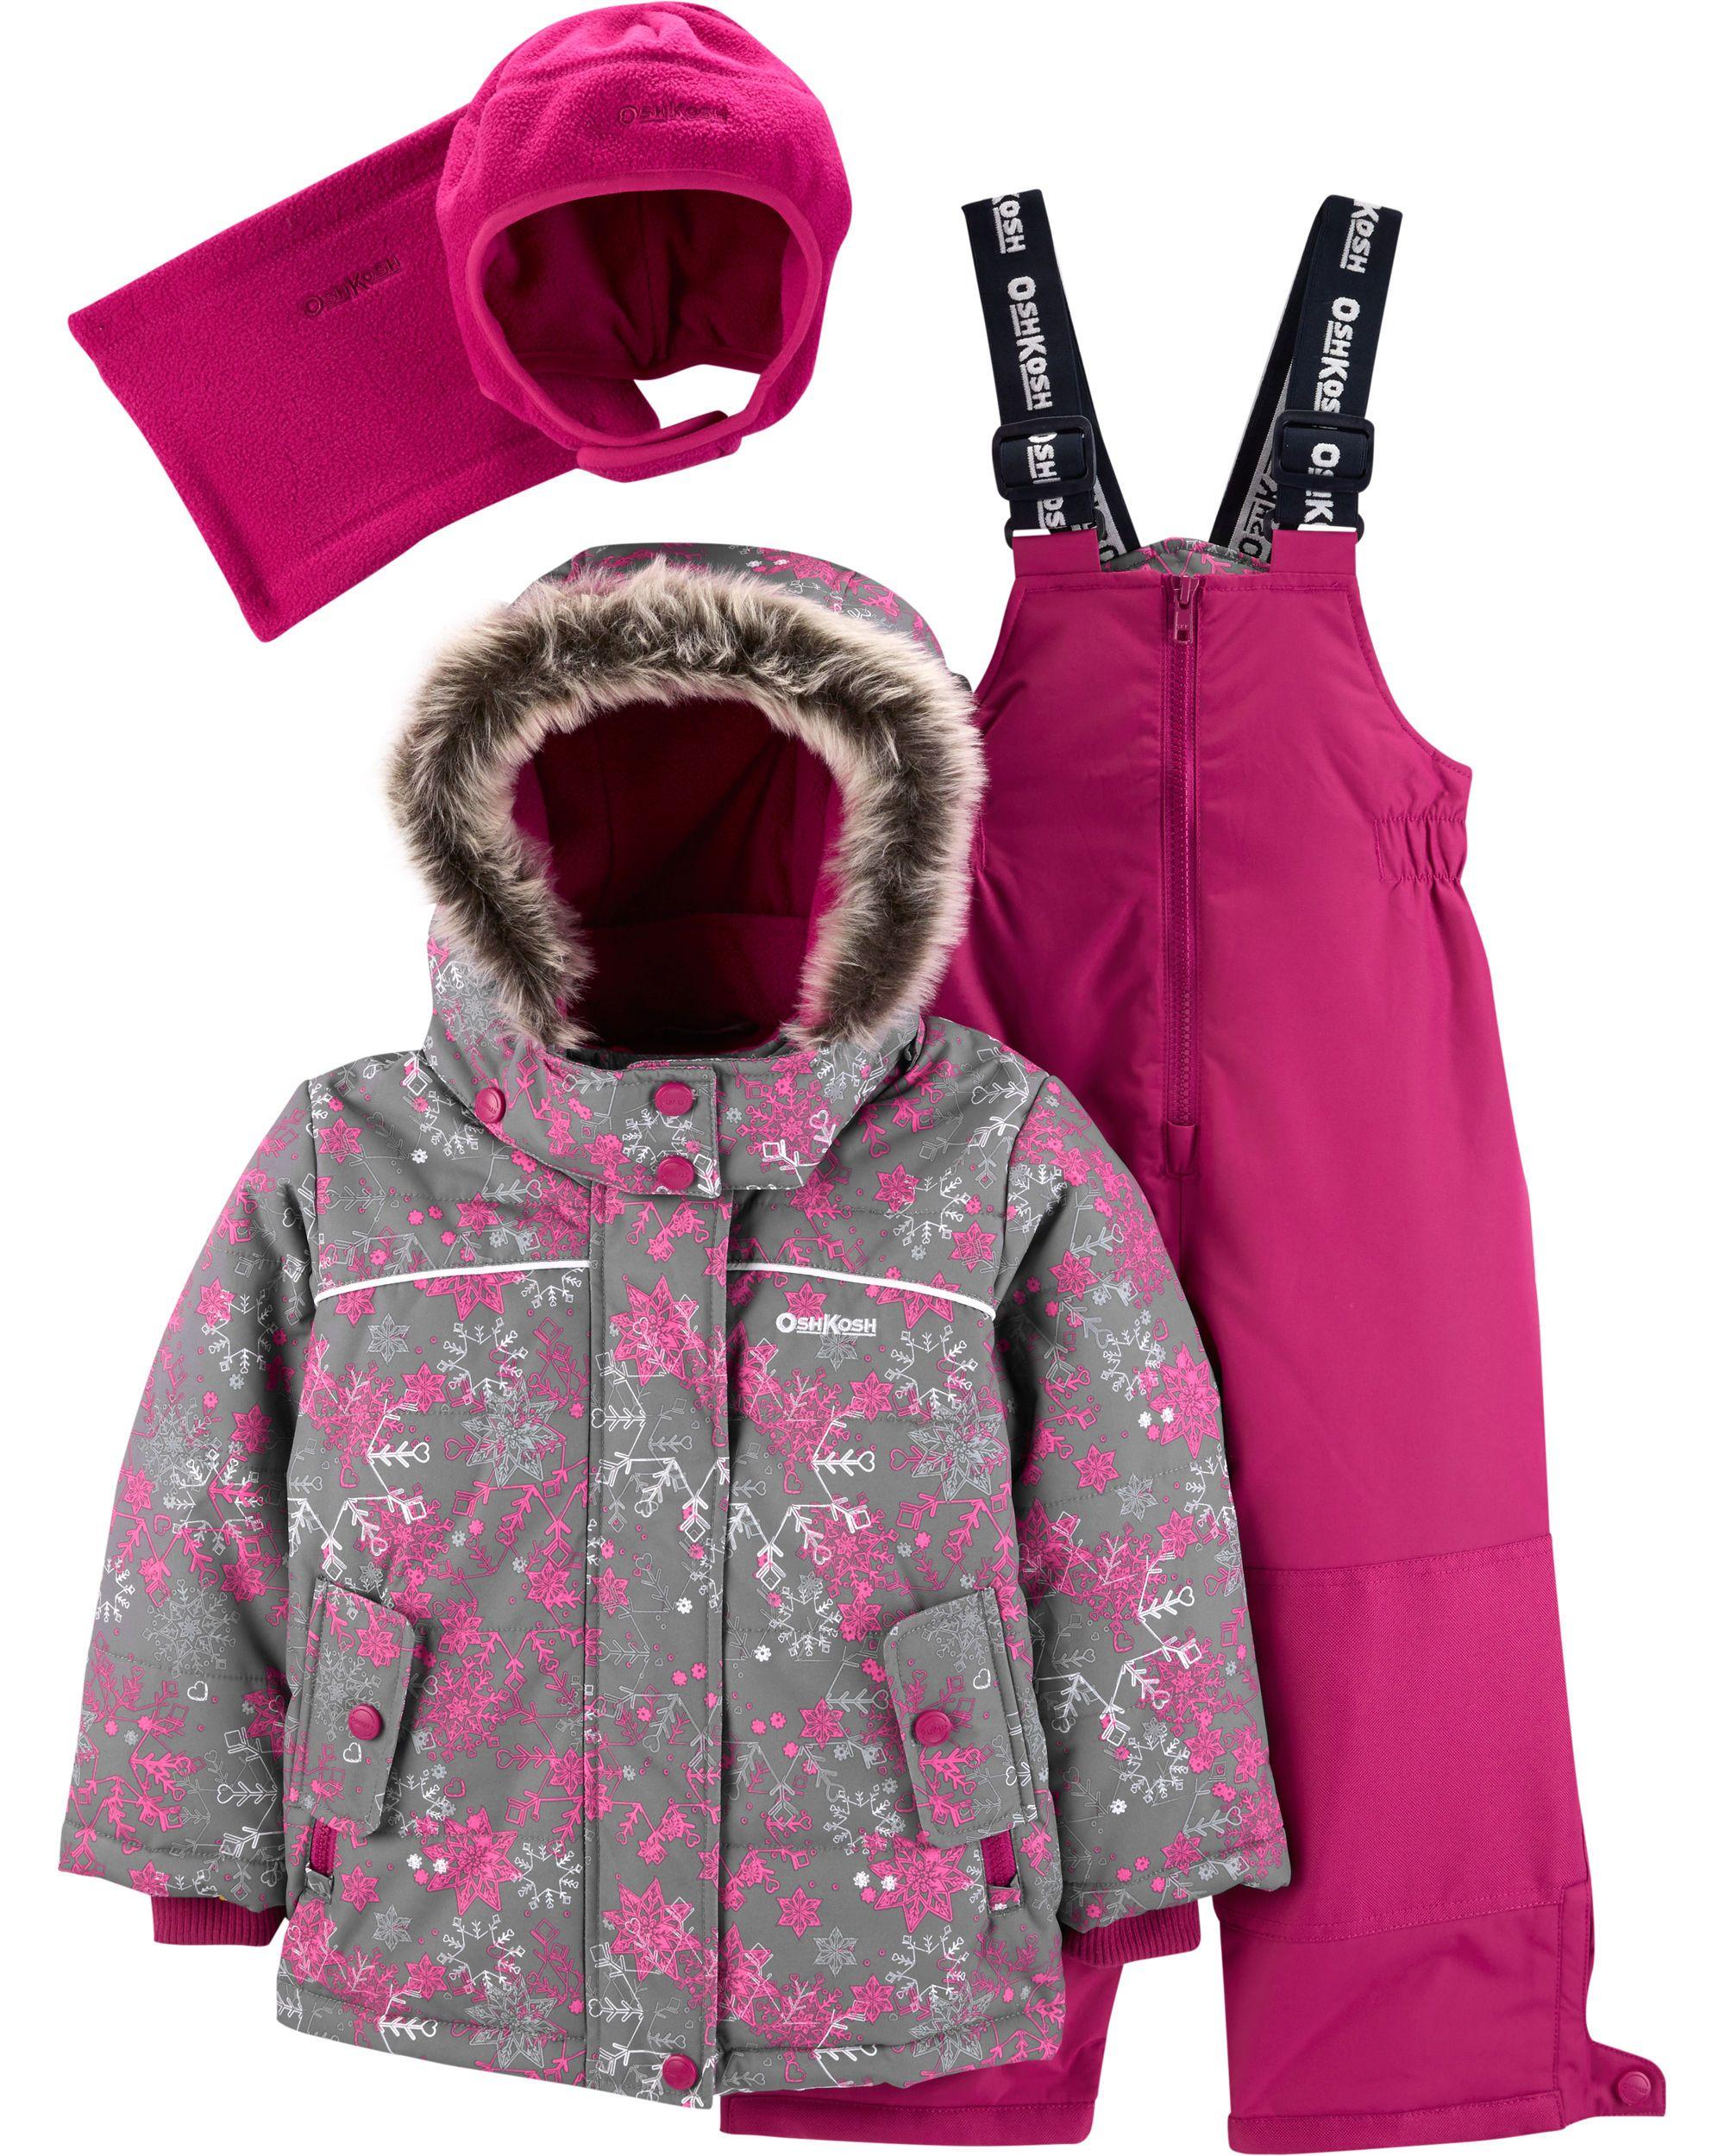 77d30b5f6 OshKosh B gosh 2-Piece Fleece-Lined Snowsuit with Bonus Hat   Neck ...